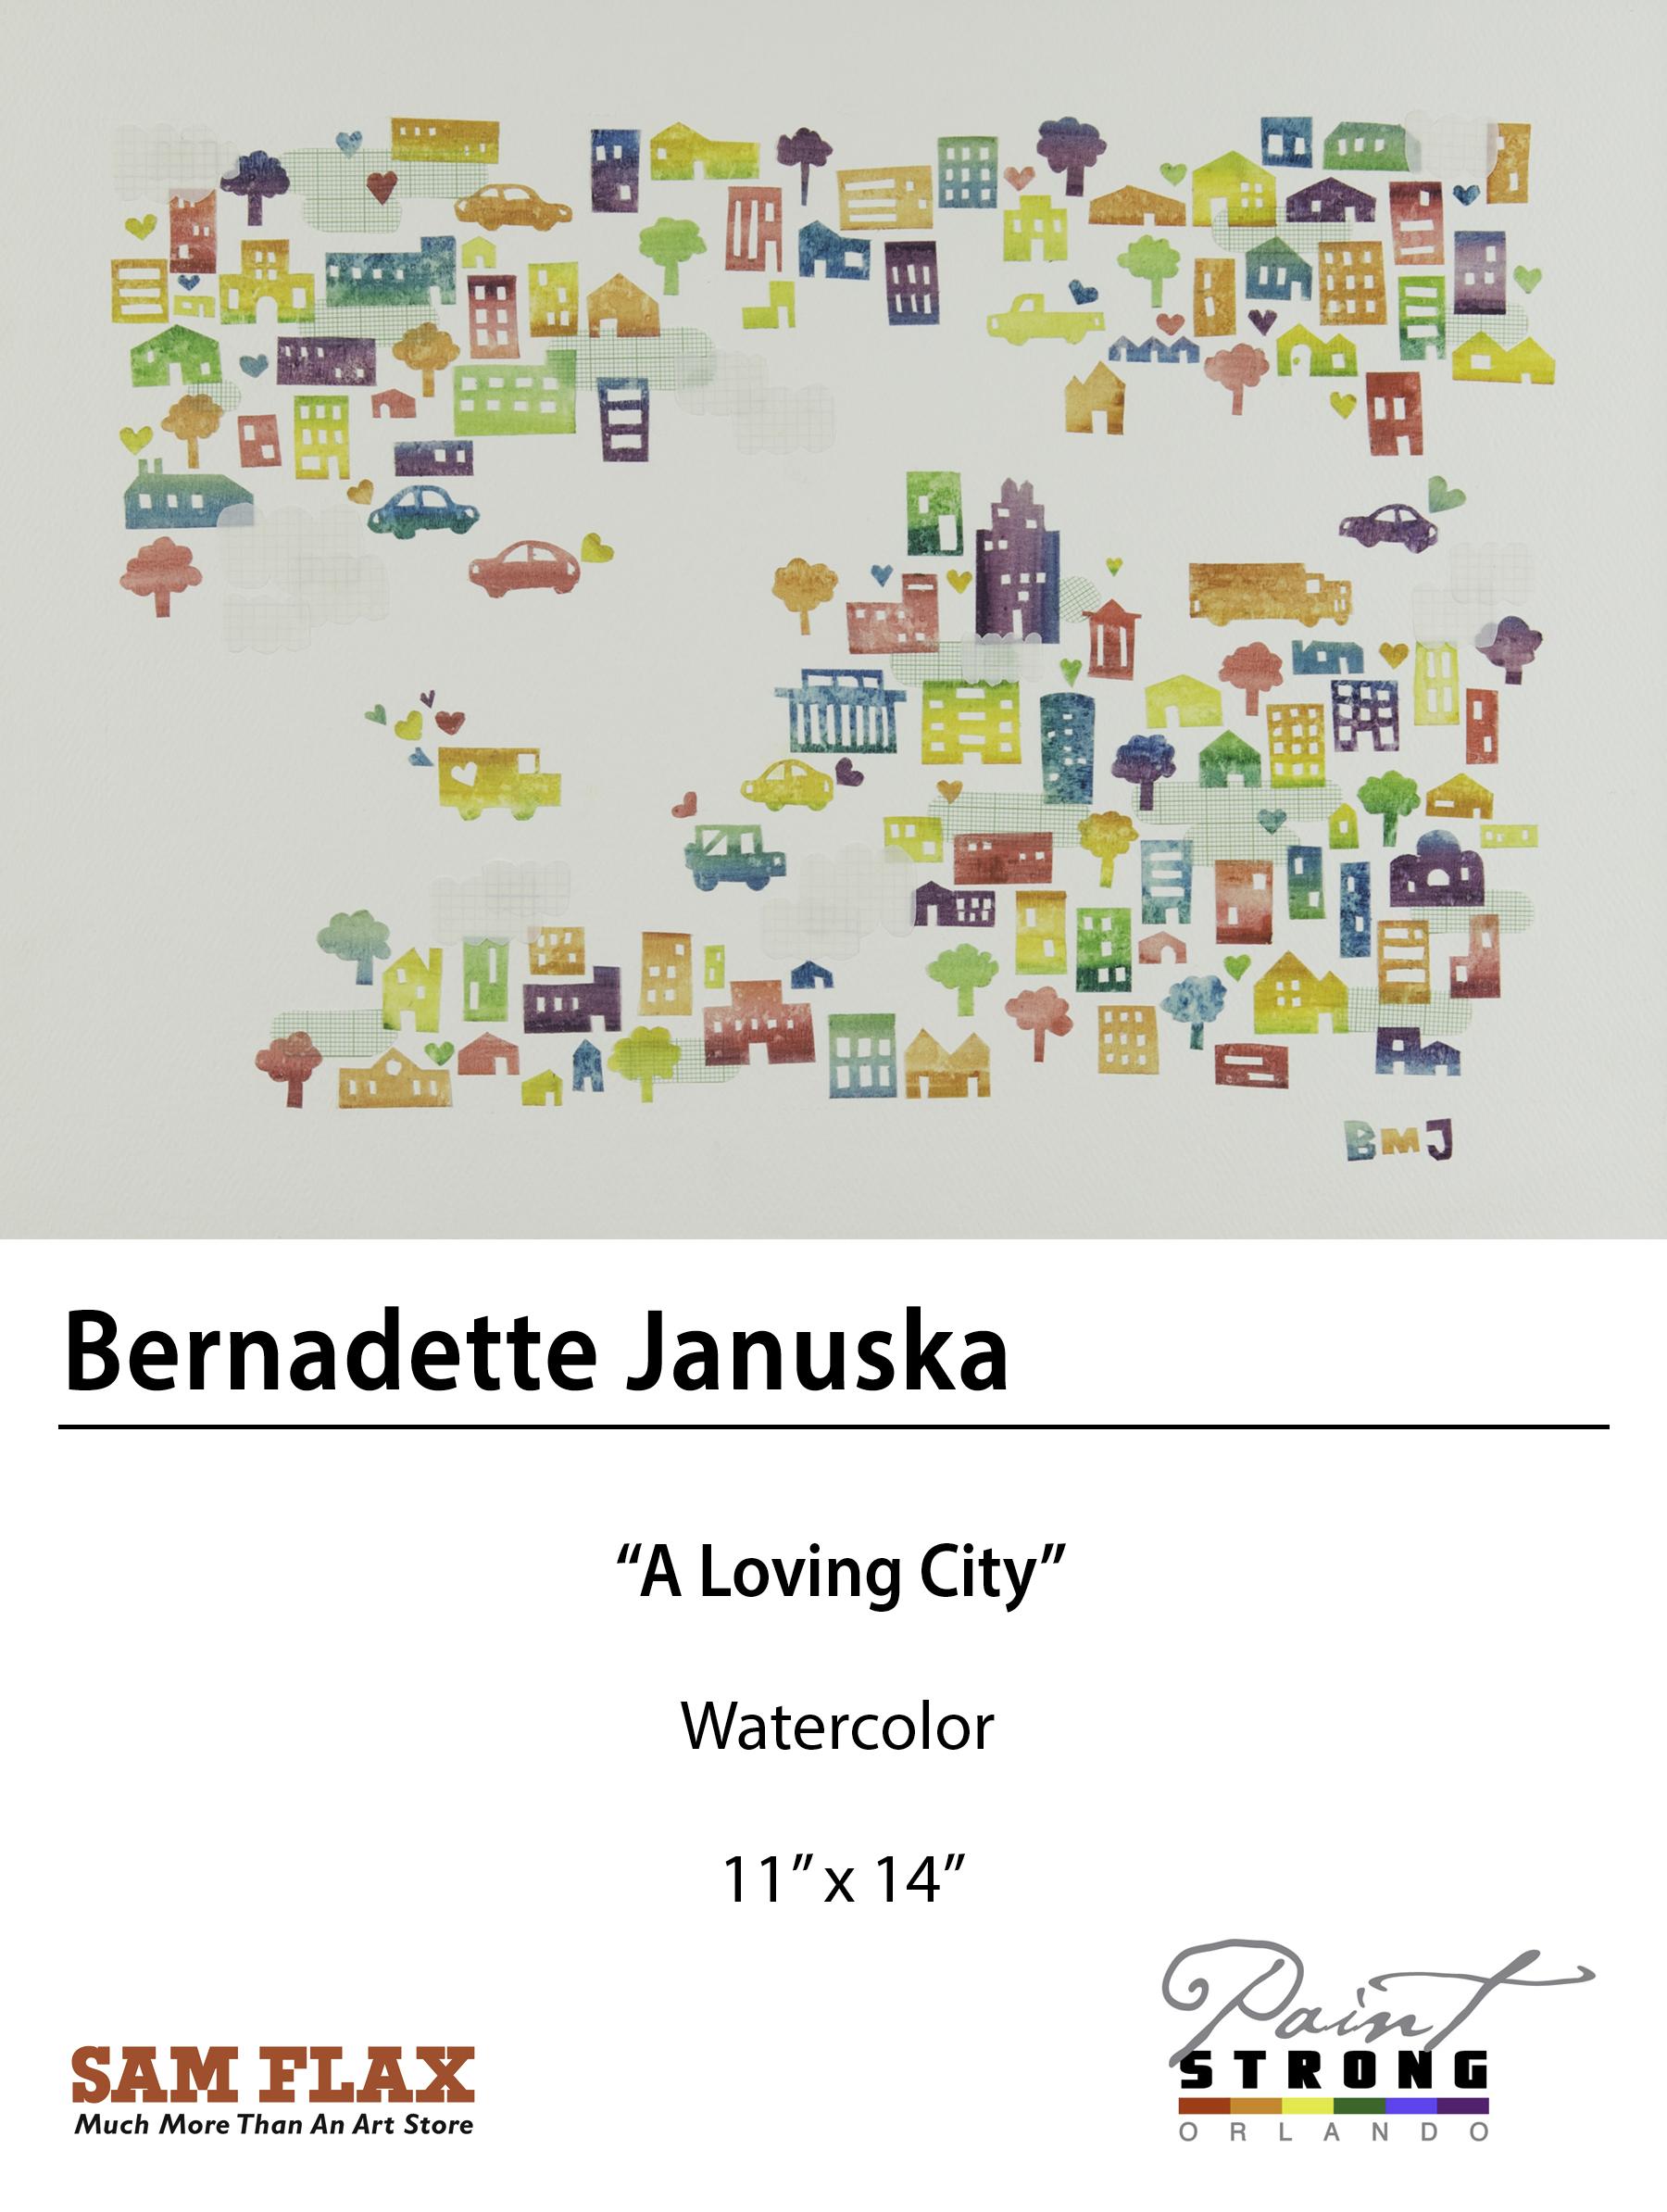 Bernadette Januska